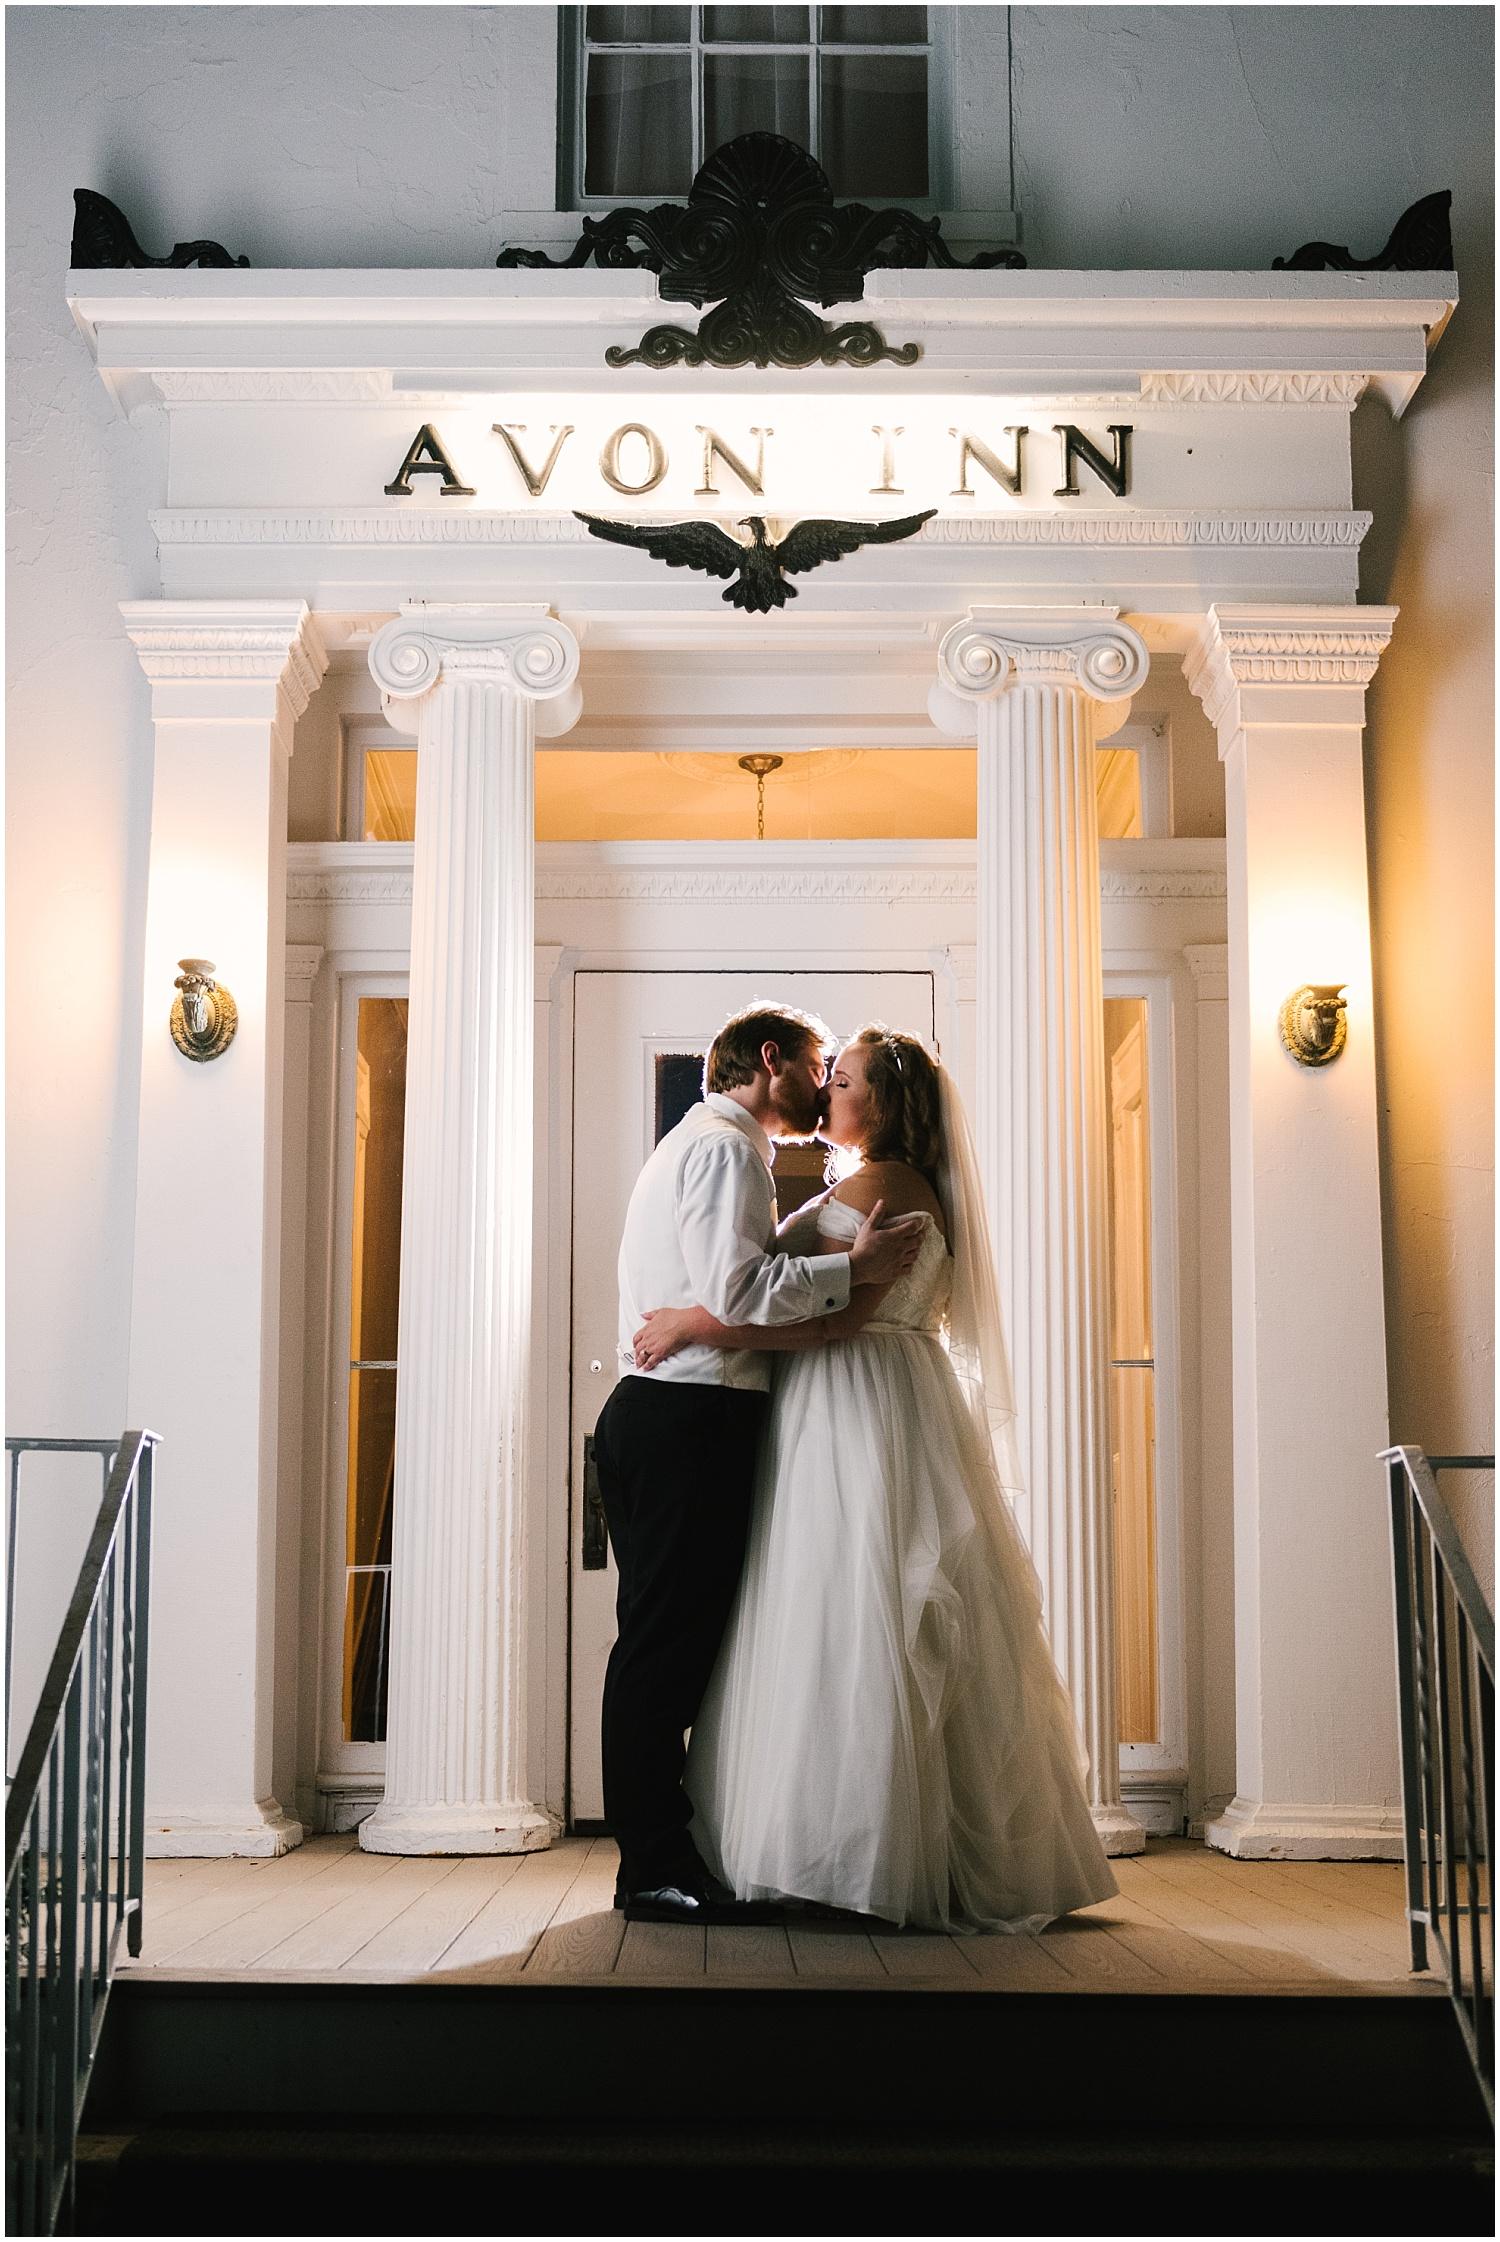 the+avon+inn+wedding+photographer (88).jpg